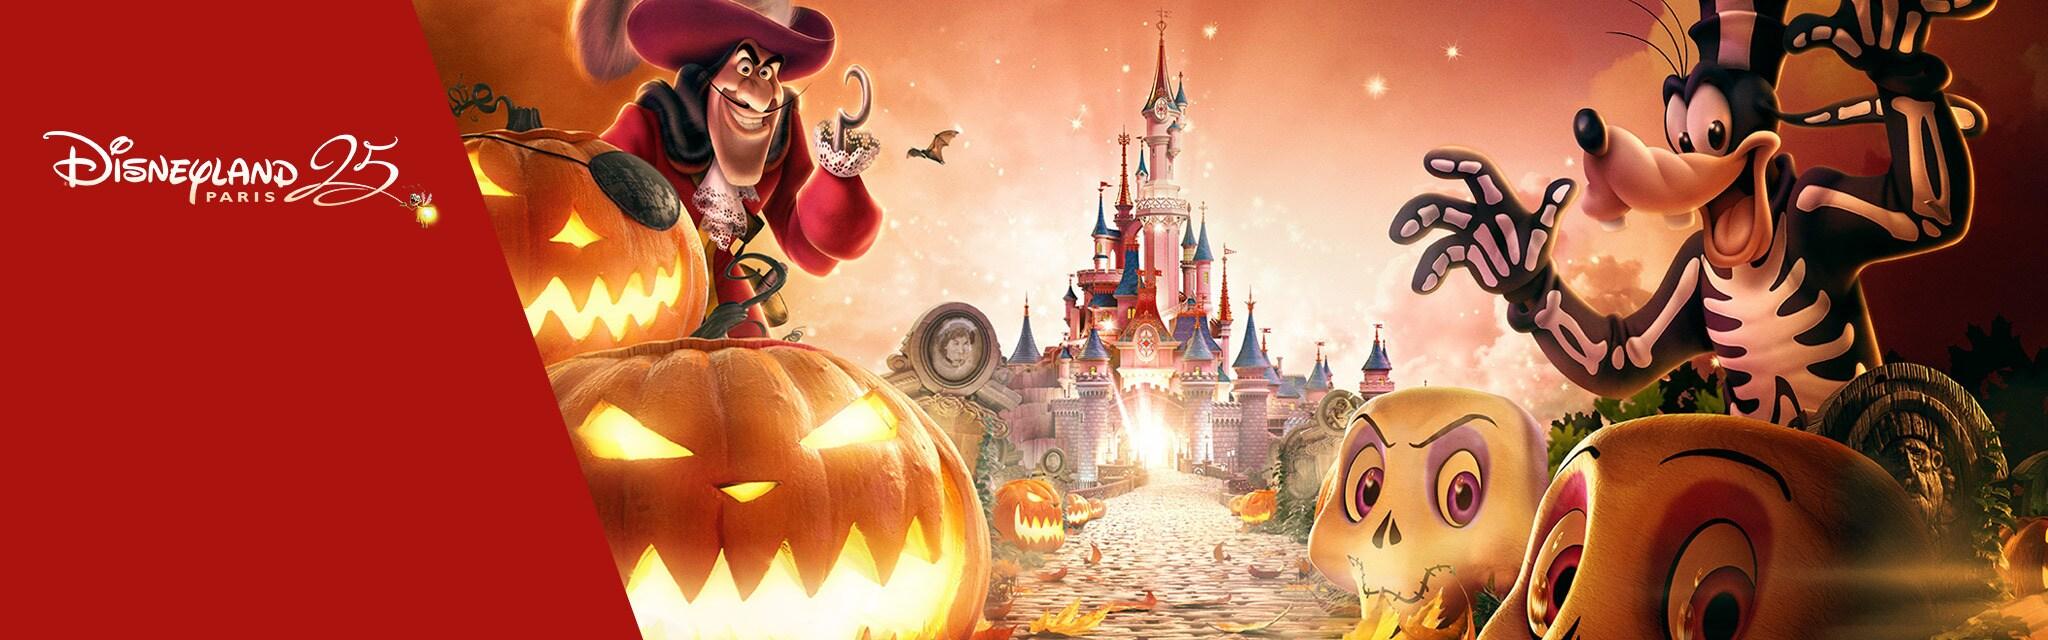 BENL Homepage - DLP Halloween